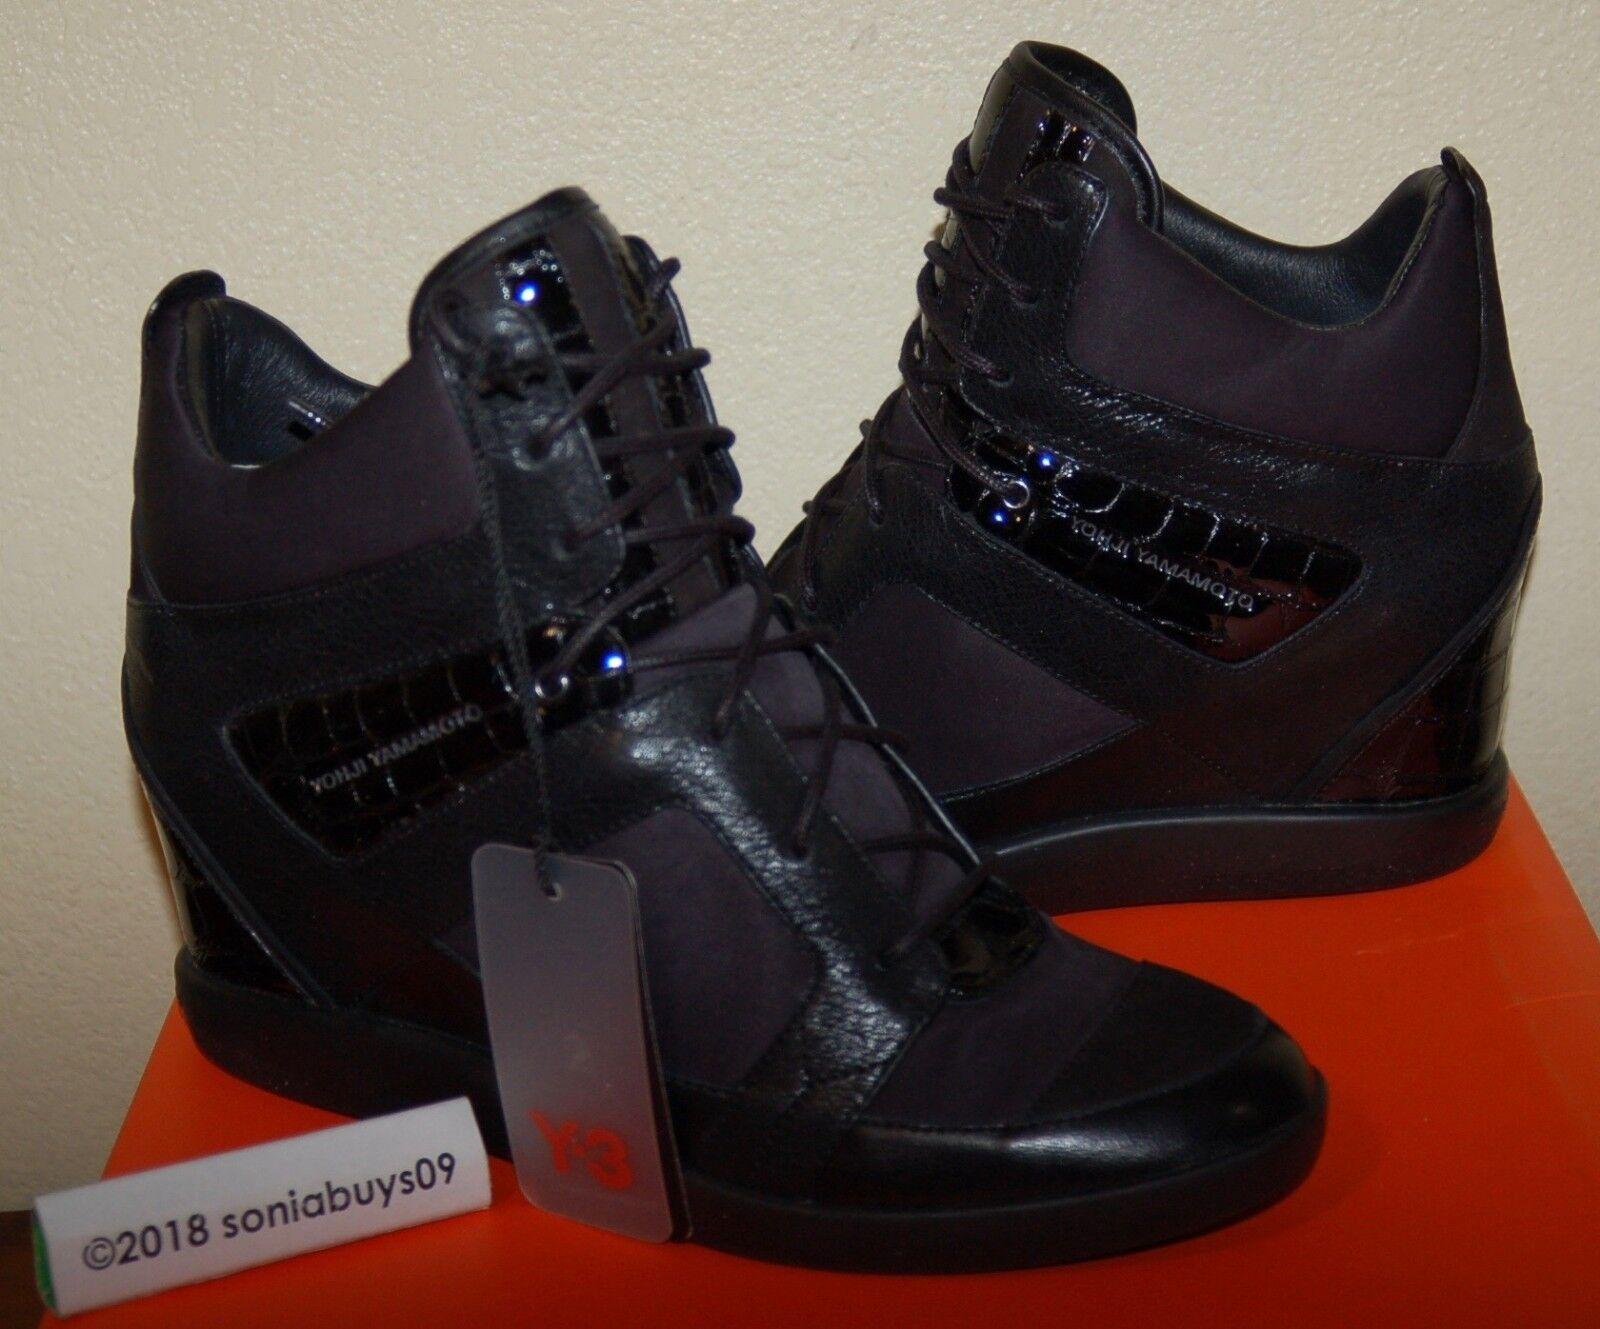 Adidas Adidas Adidas donne oe sukita ii moda le scarpe da ginnastica, q35275, nero, taglia 9 79acb2